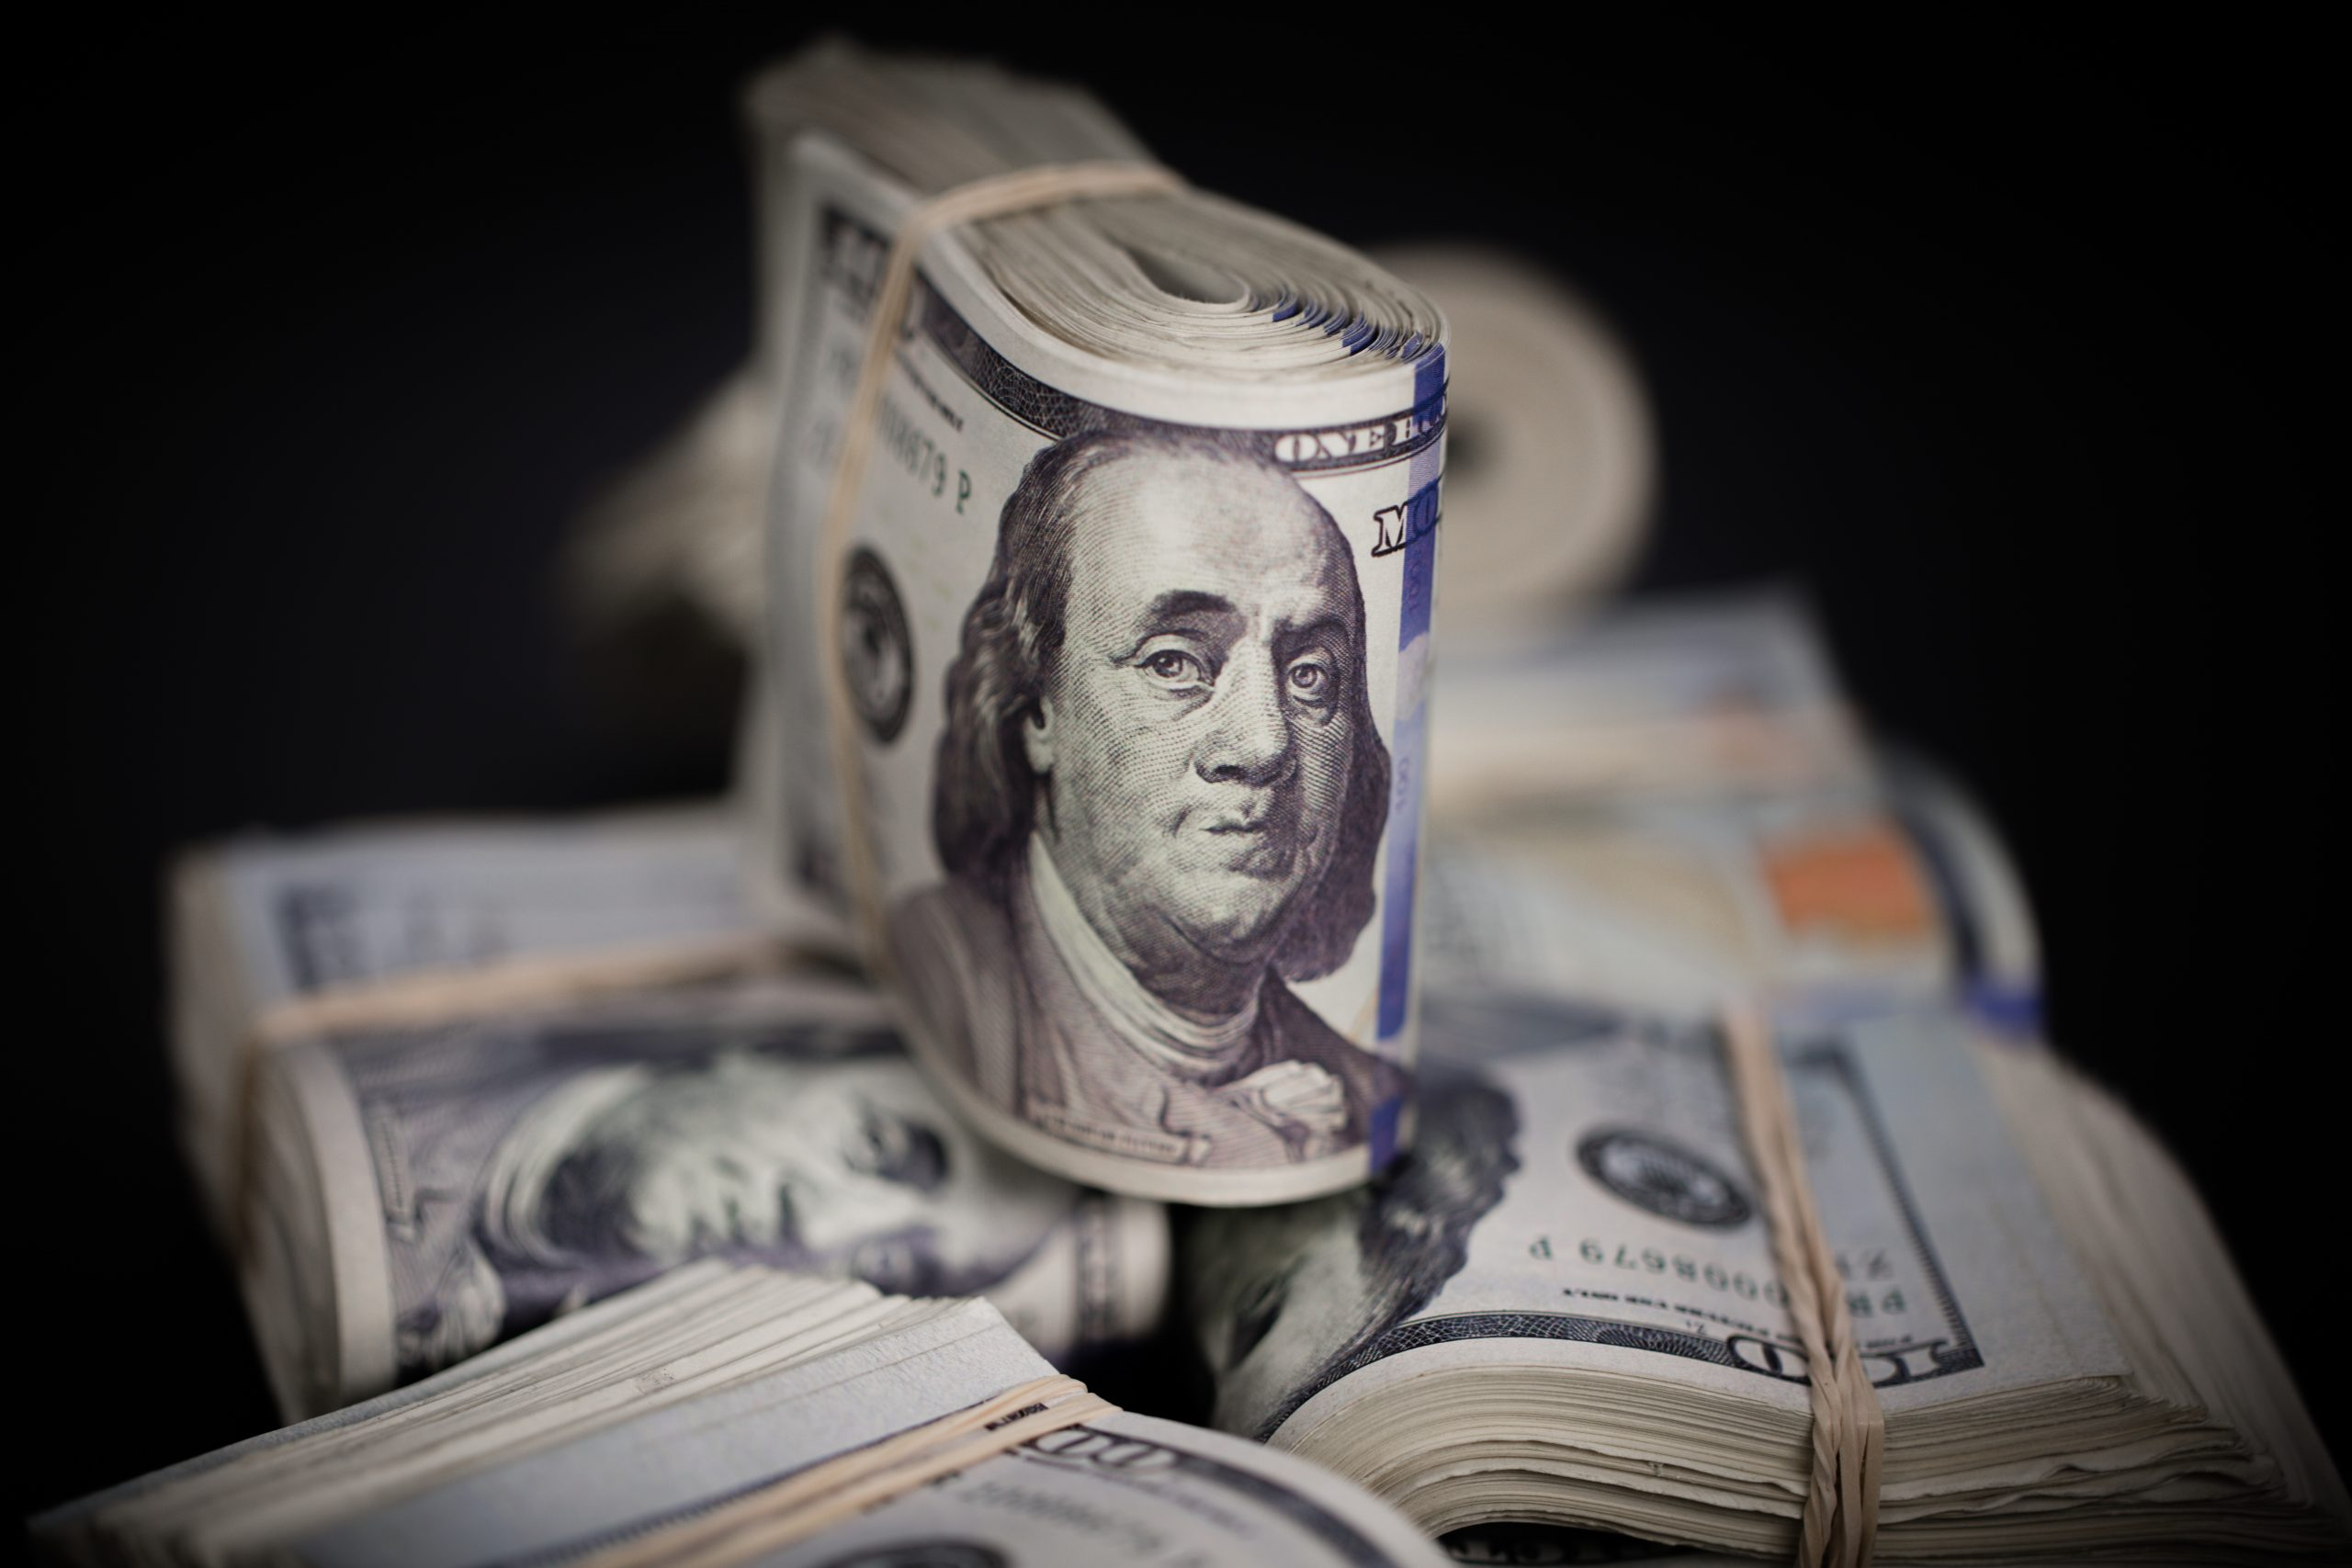 $100 dollar bills fold wad of prop